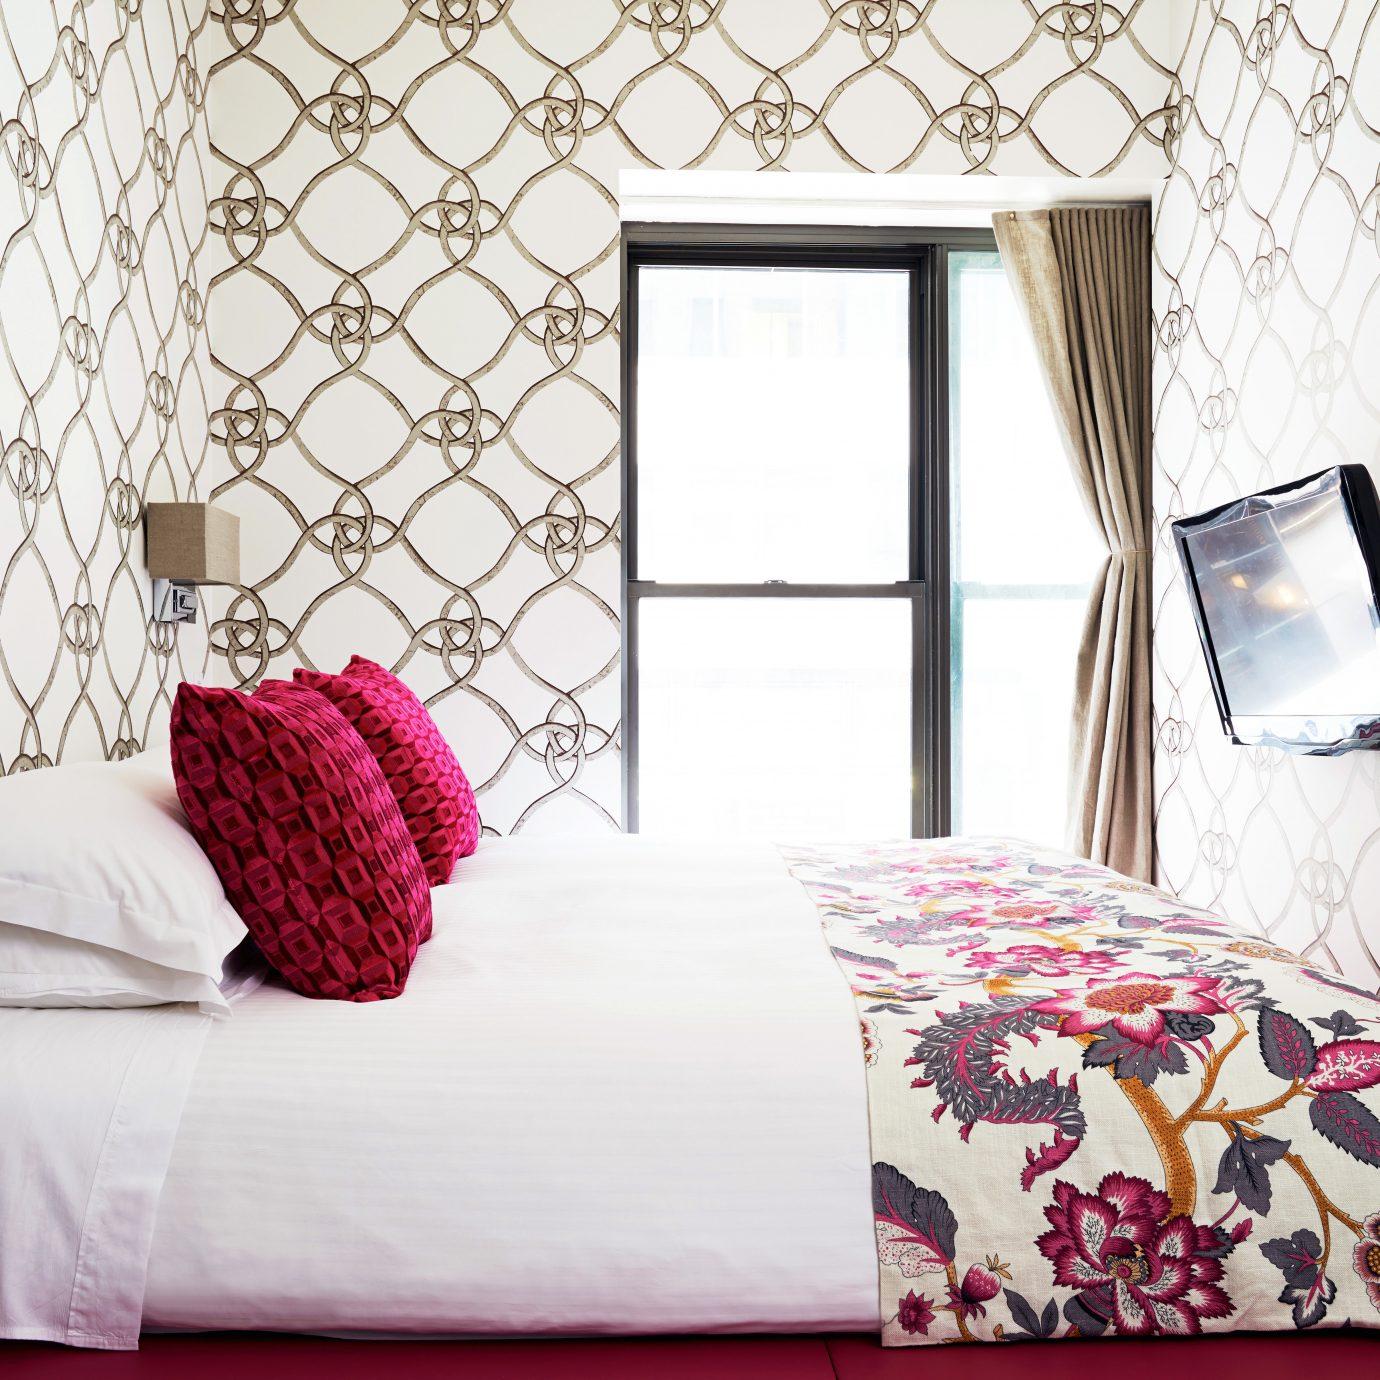 Bedroom Boutique Budget City Hip Modern Suite living room bed sheet textile wallpaper flooring lamp